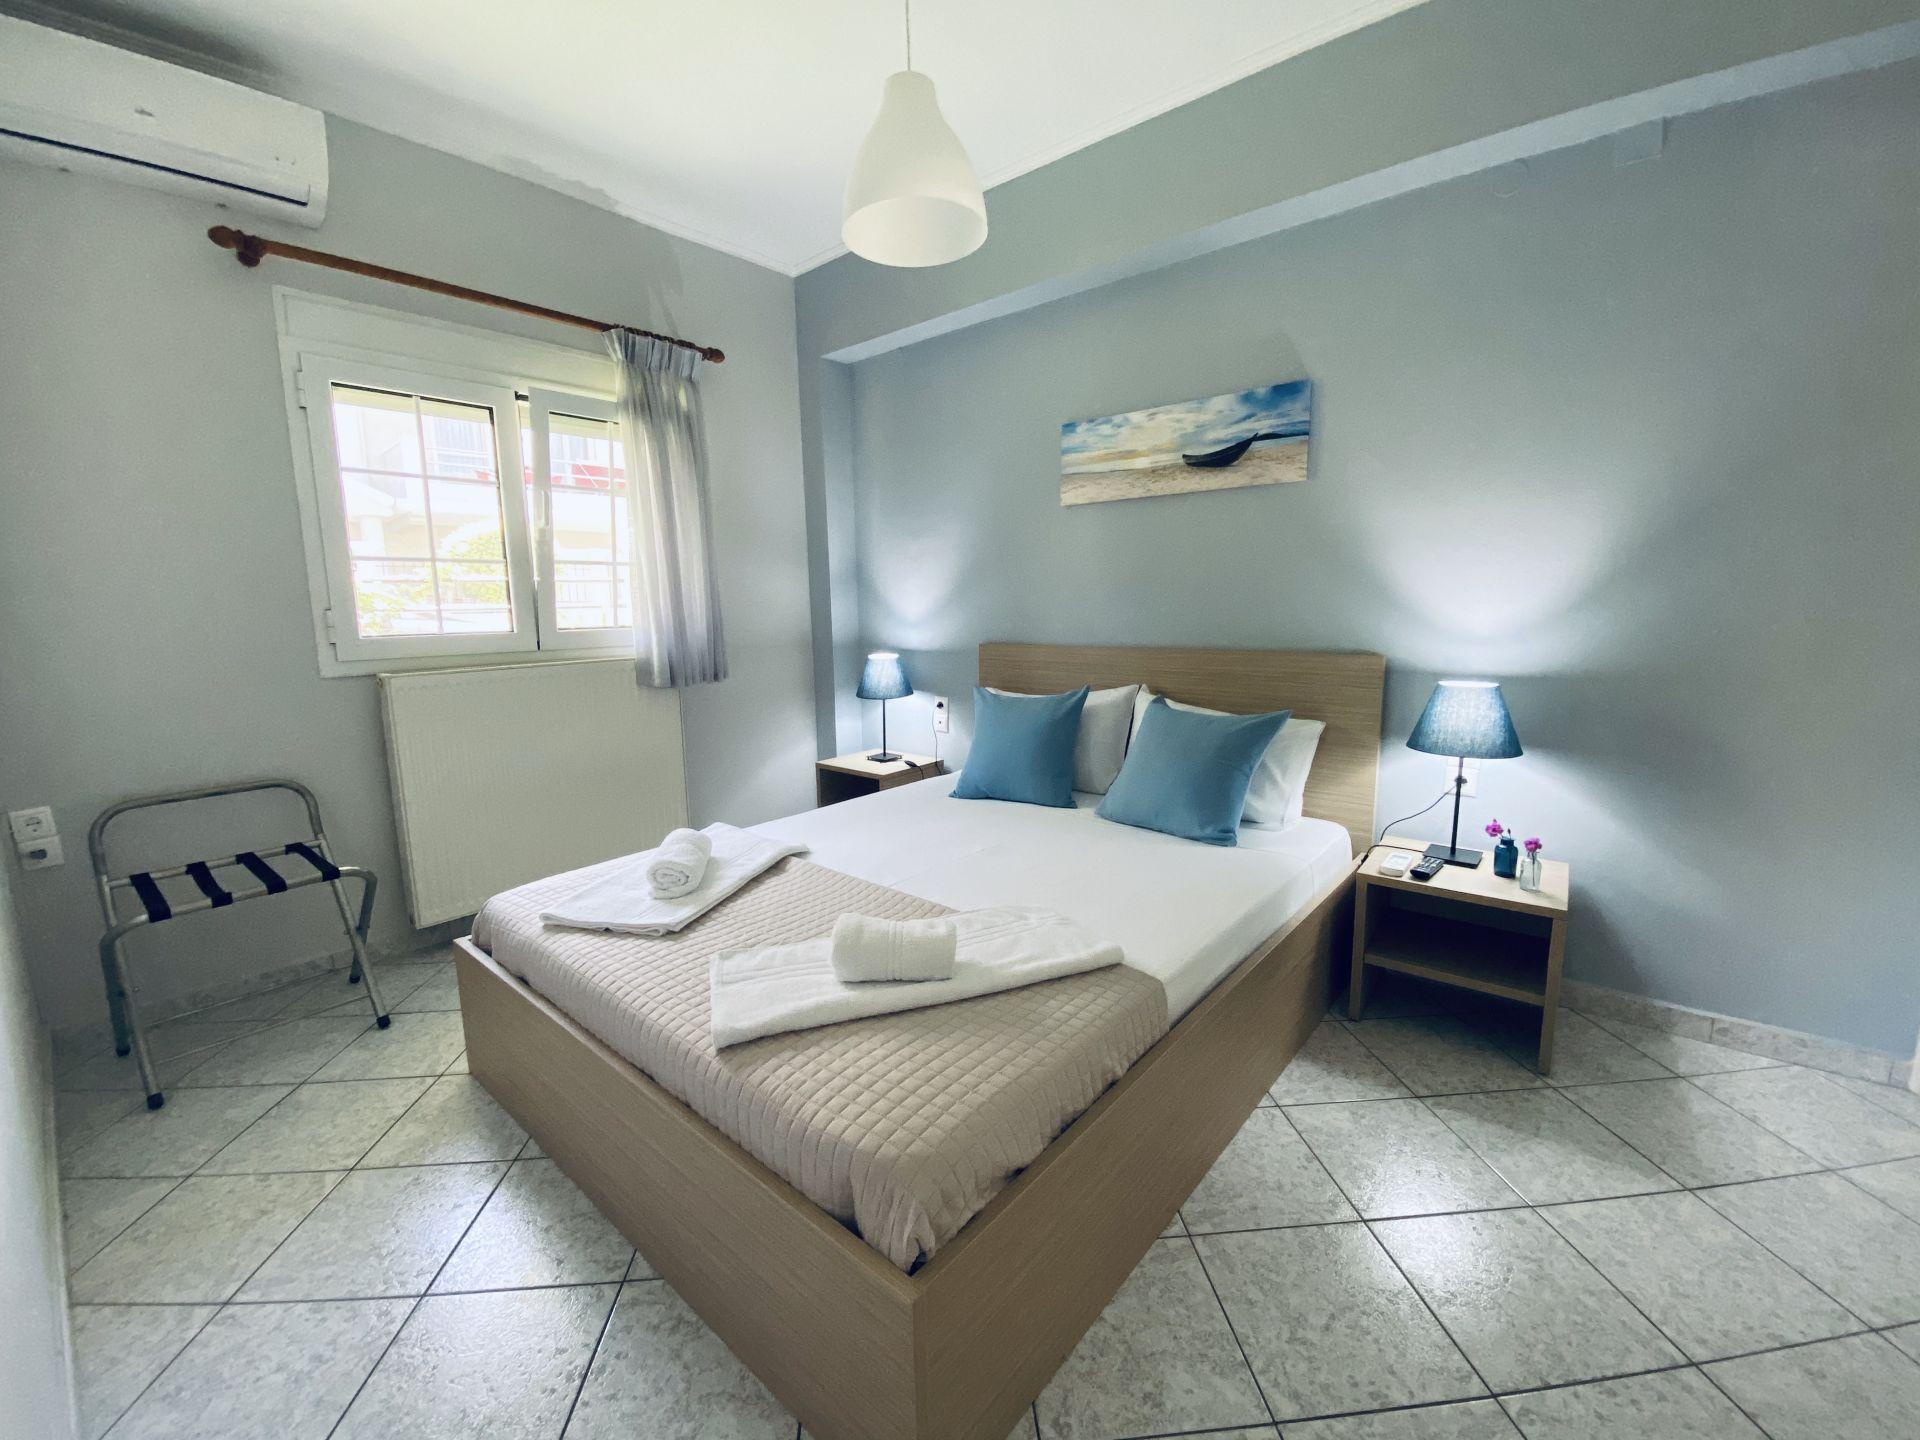 Lefkada Blue - Light Blue Apartment Bedroom